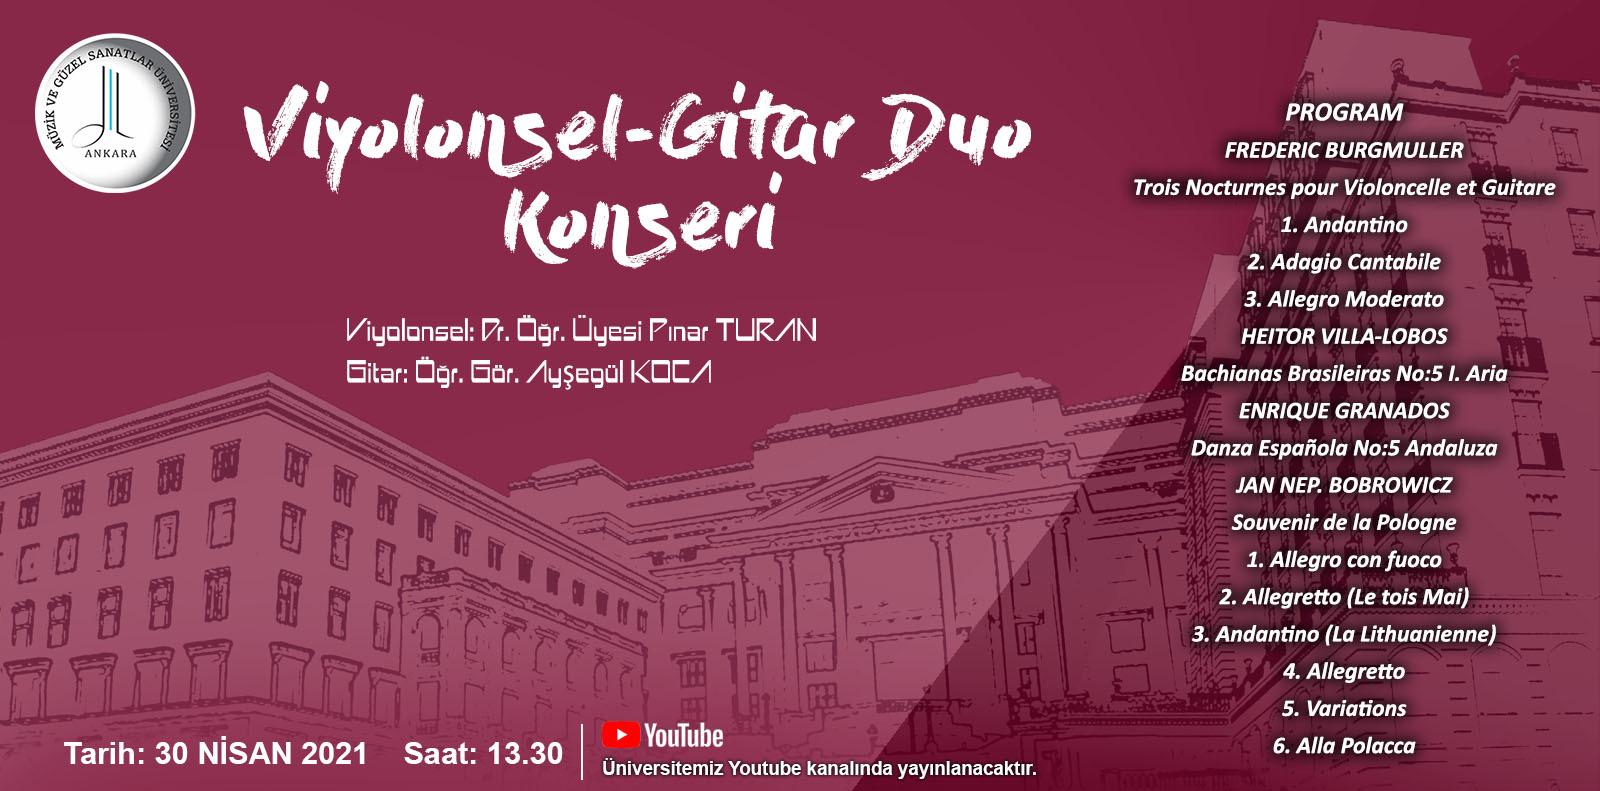 Viyolonsel Gitar Duo Konseri Slayt